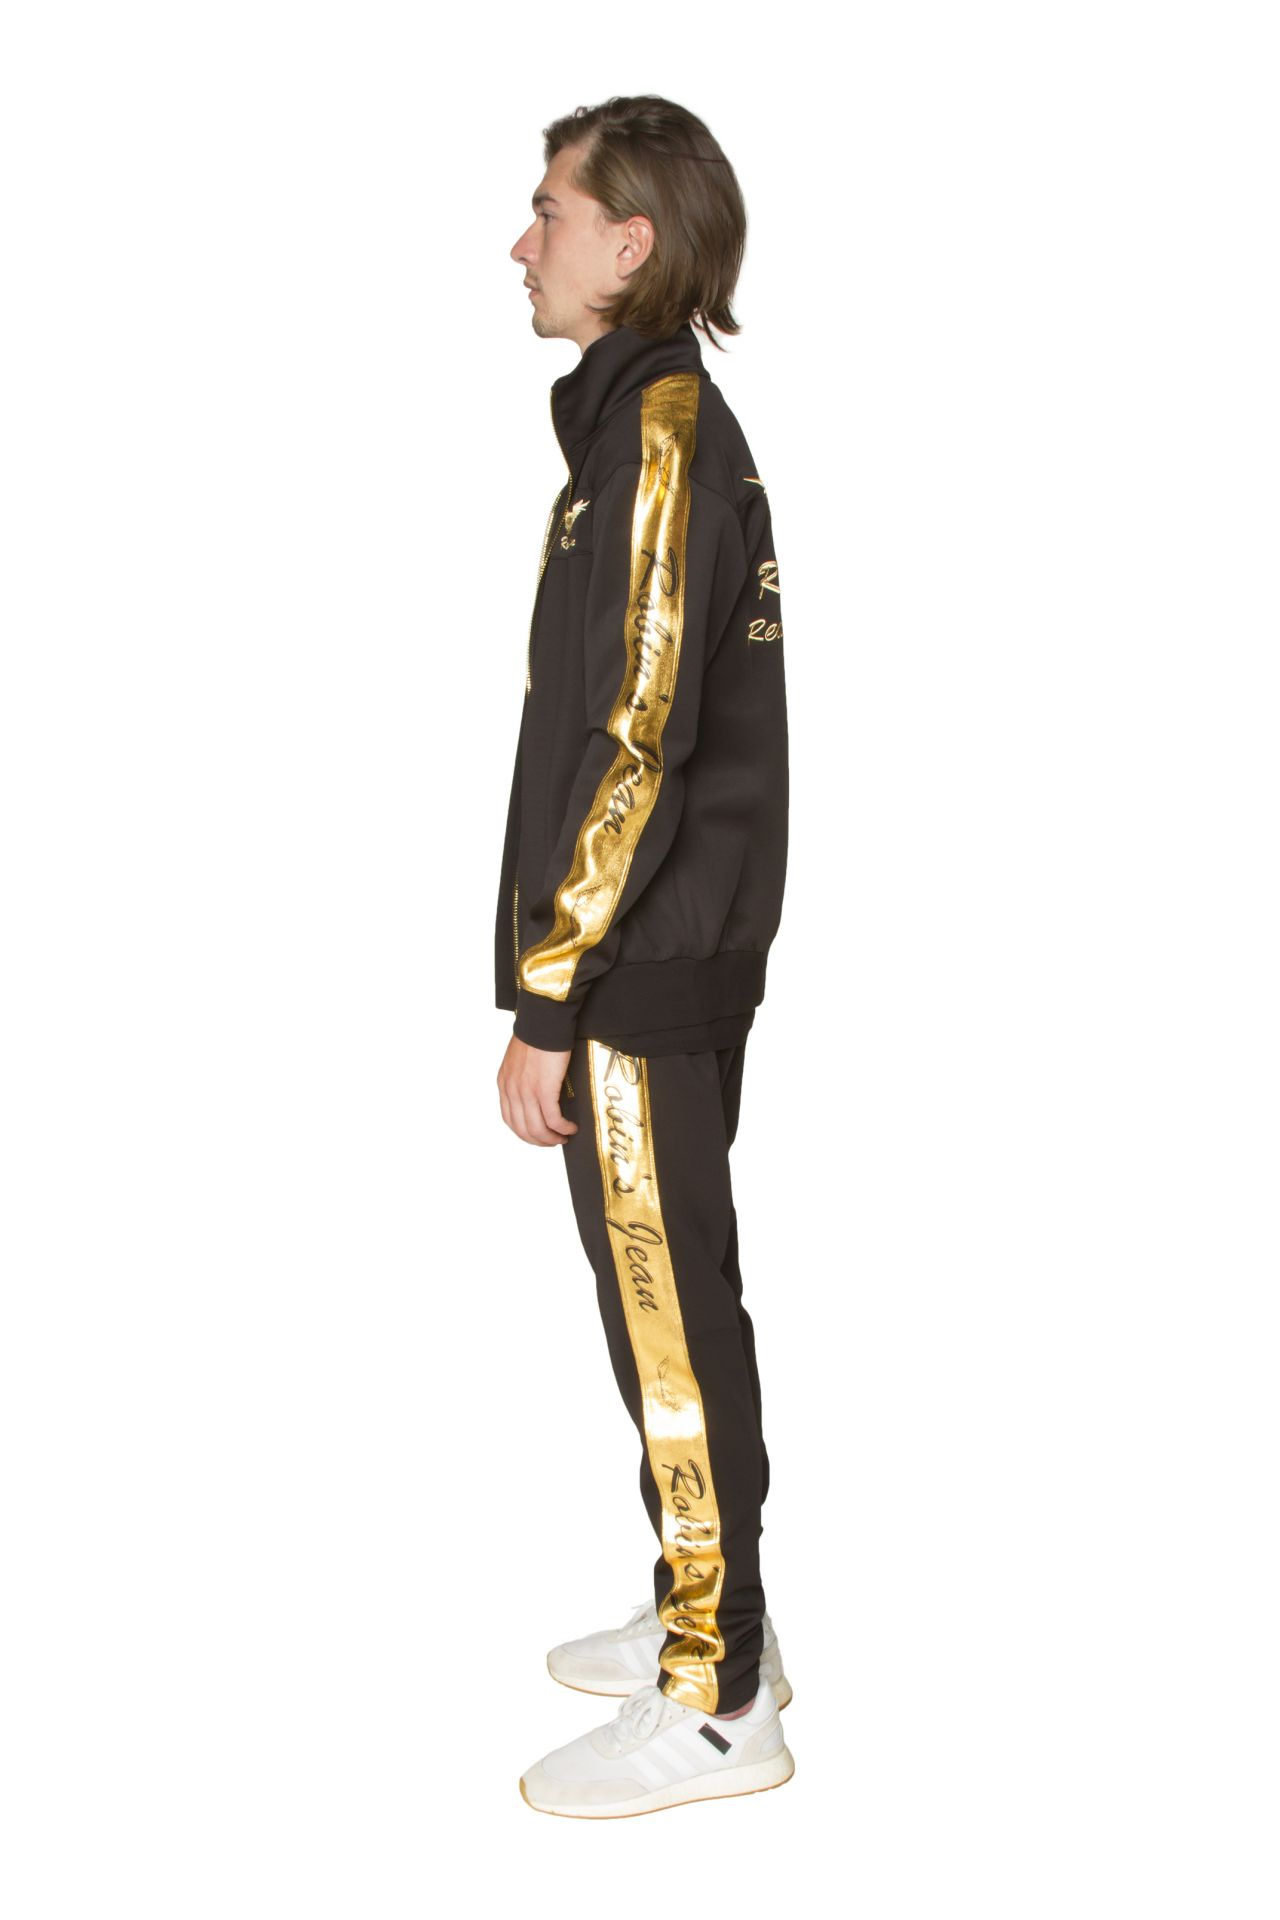 ROBIN TEAM JOGGER IN GOLD ON BLACK